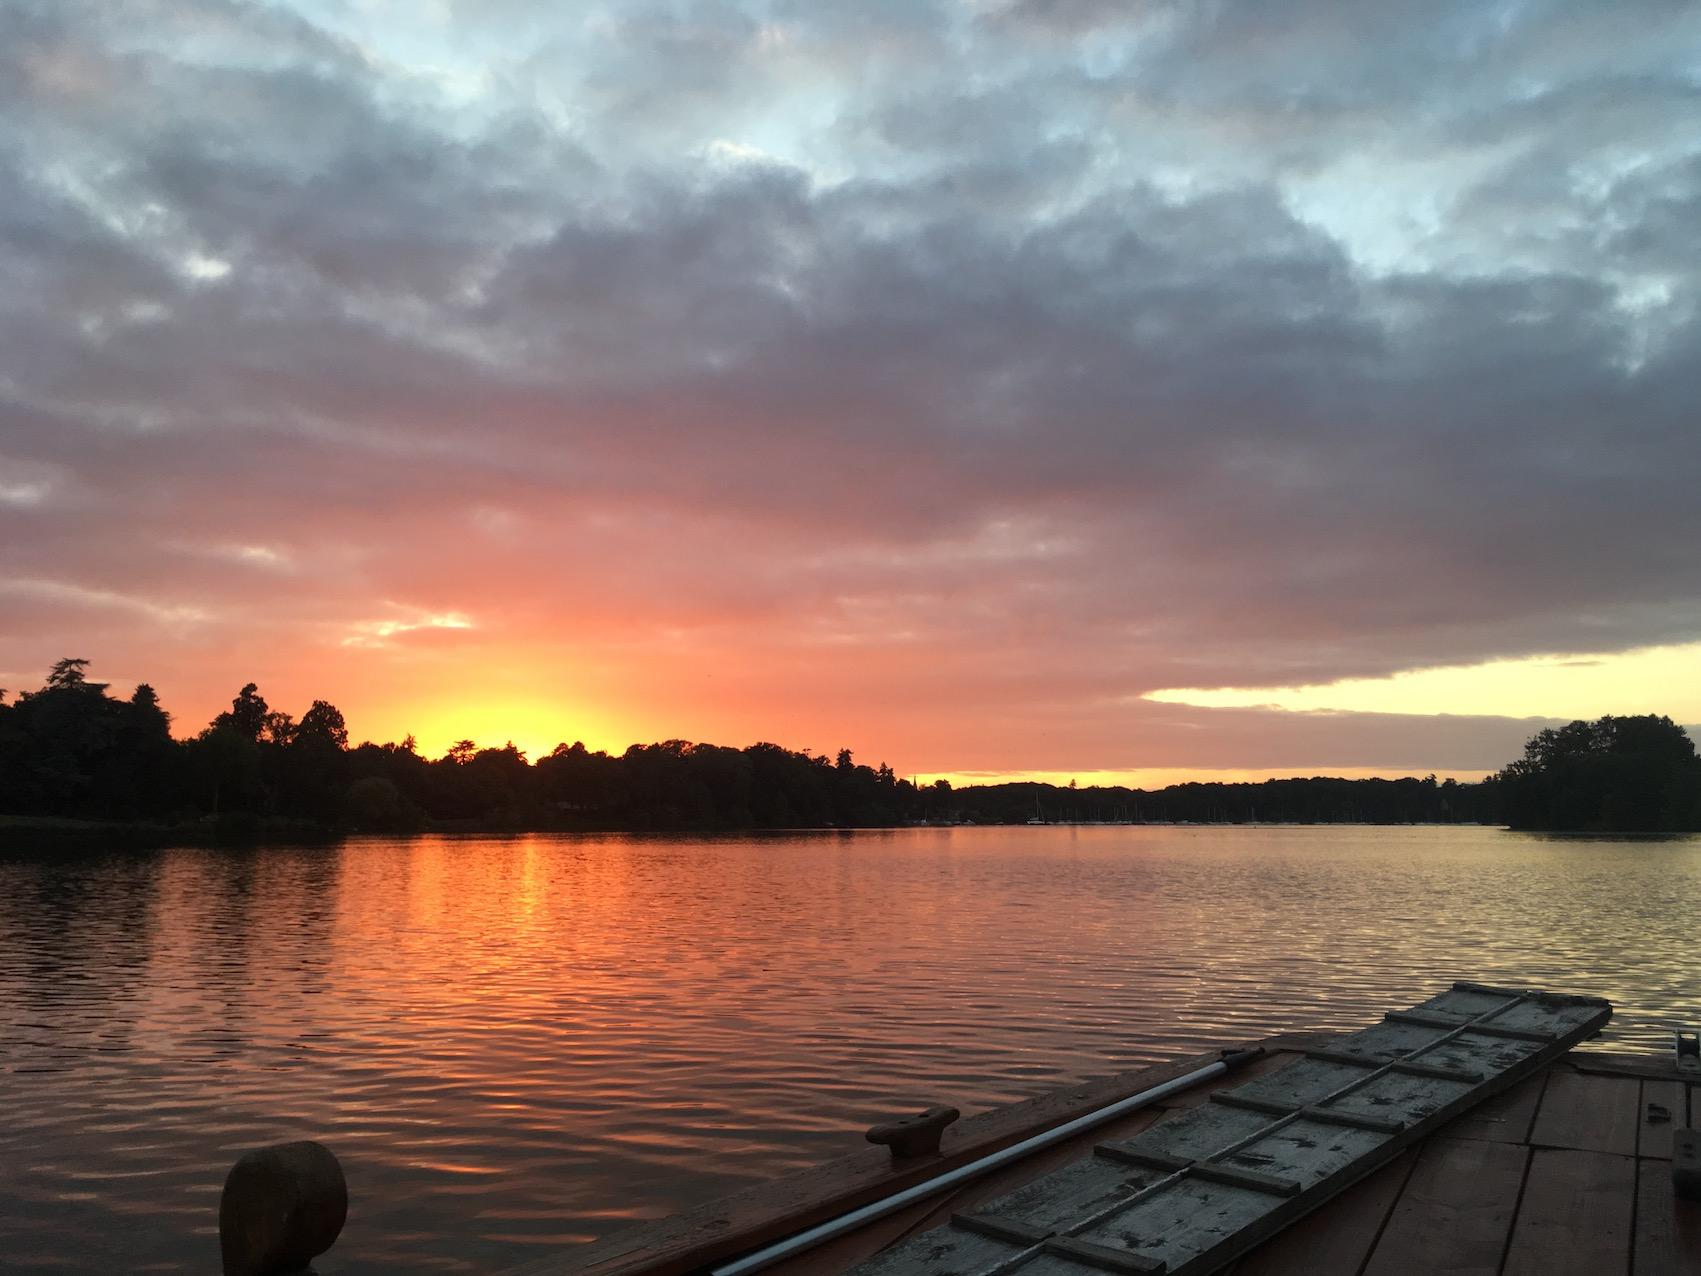 Erdre-sunset-croisière